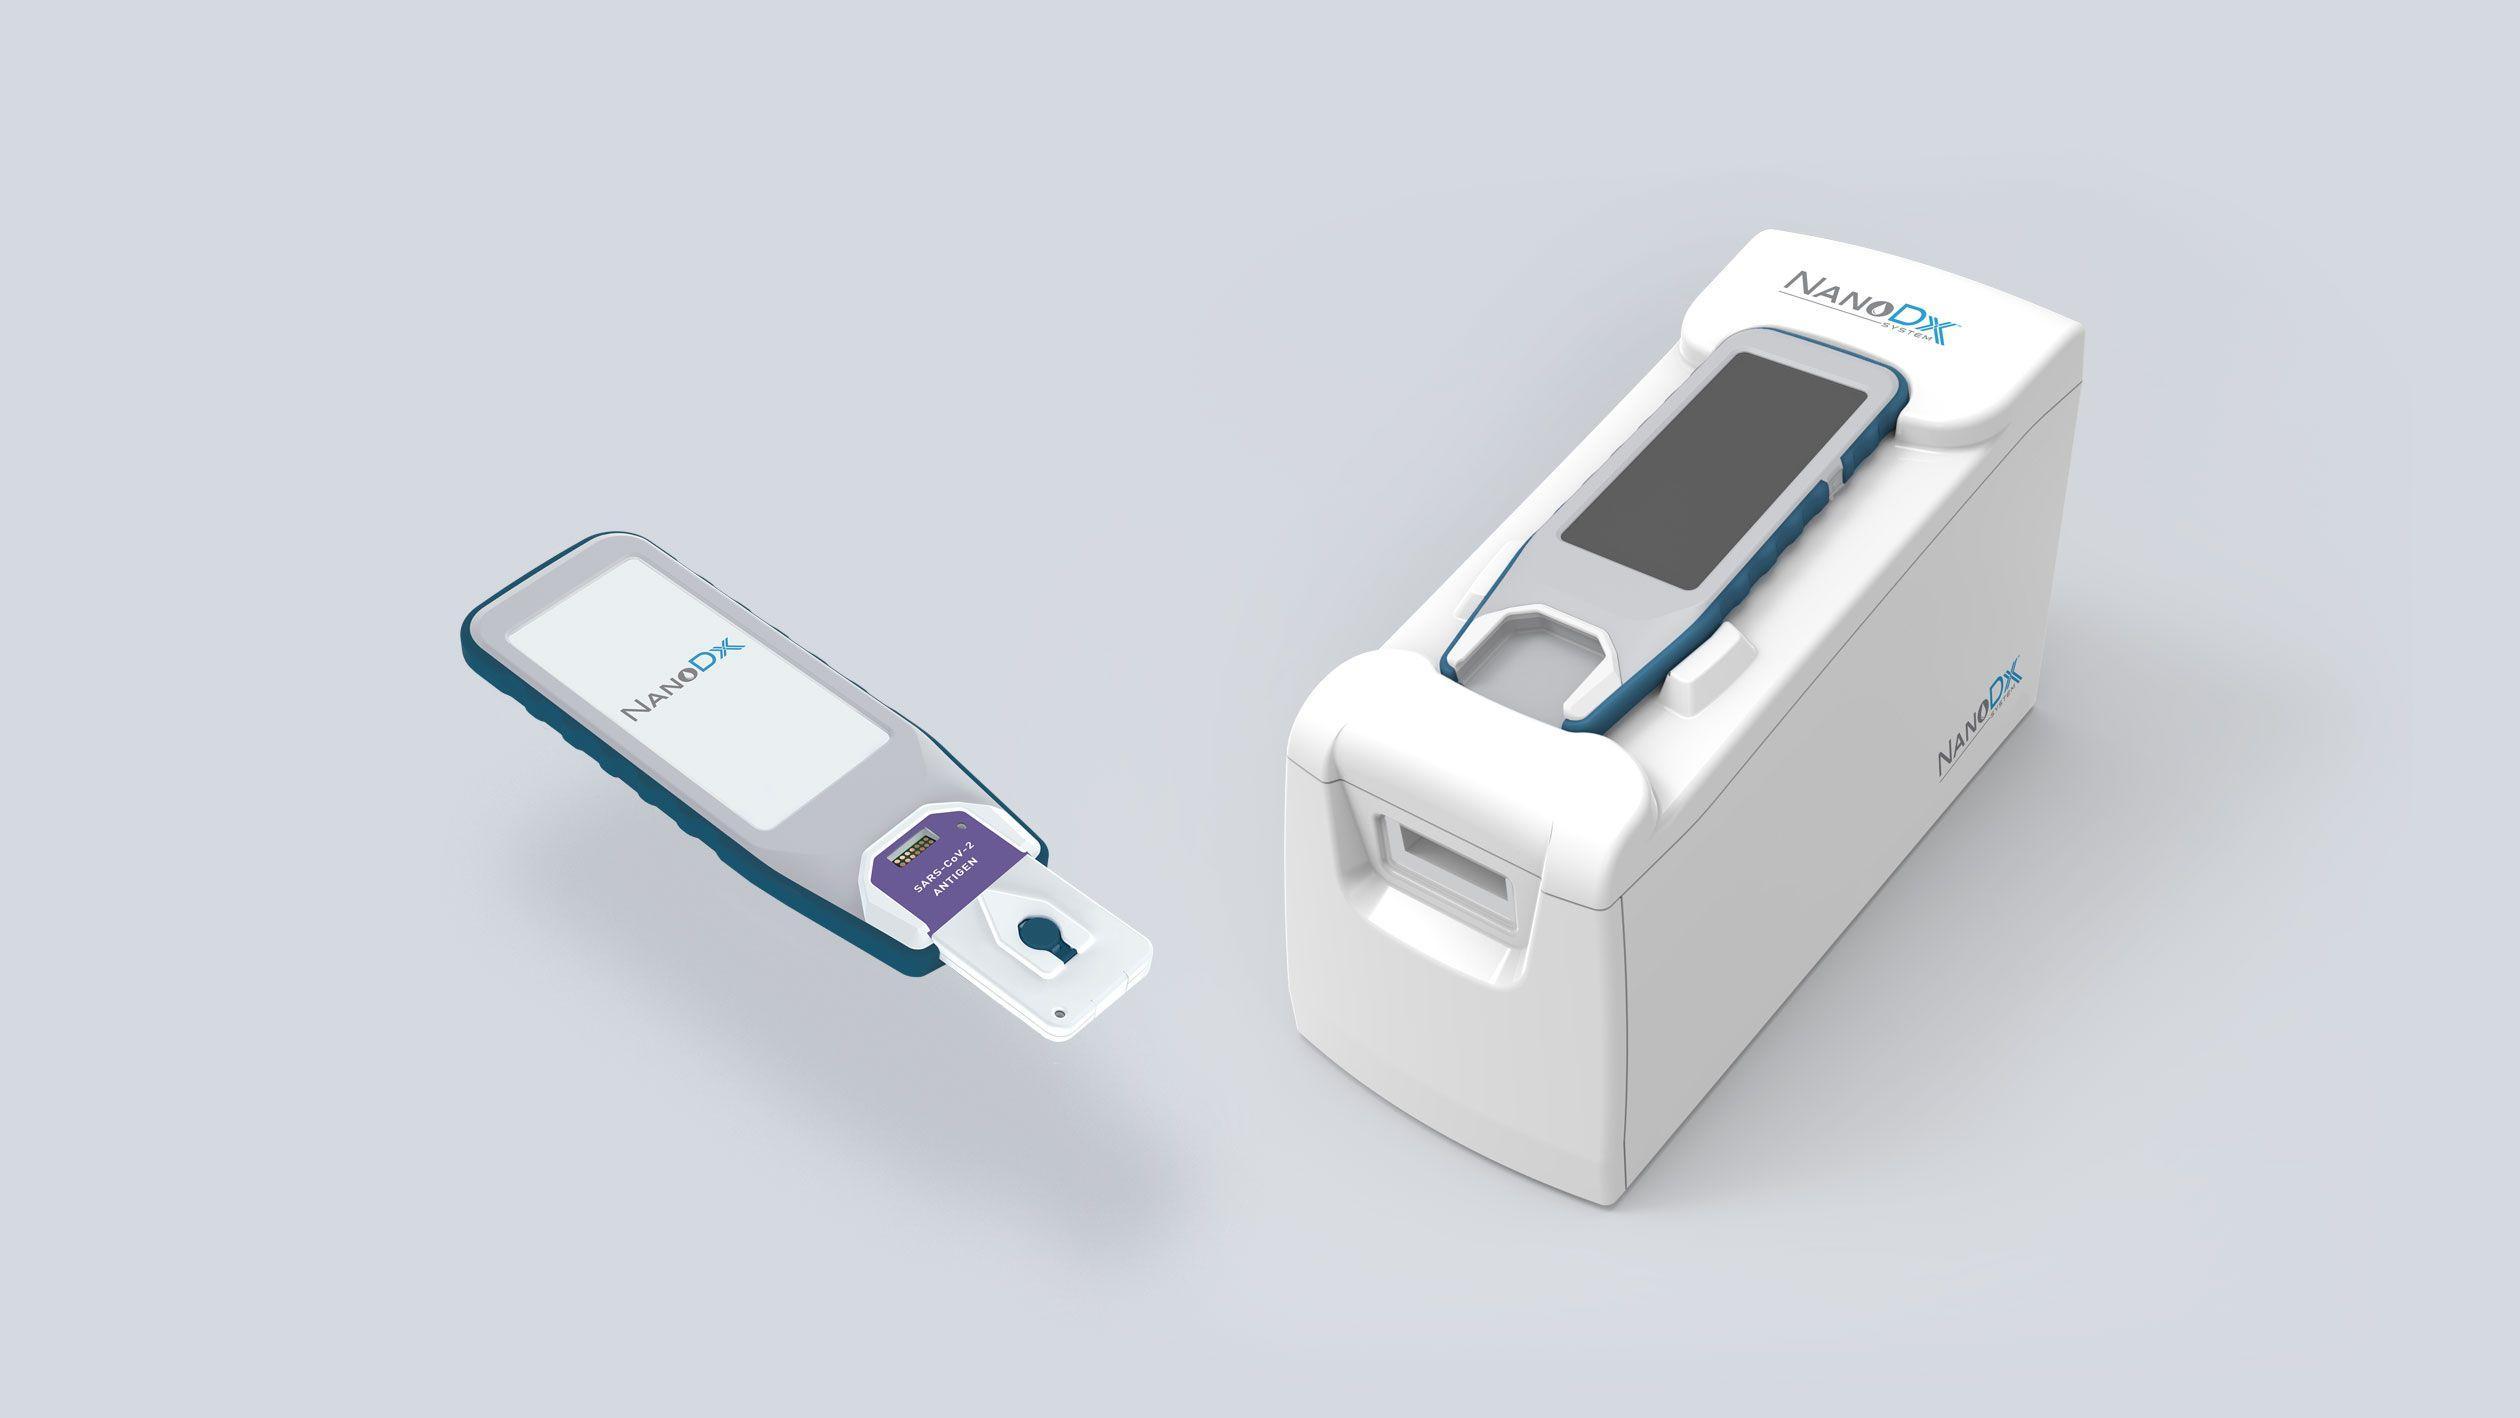 NanoDx handheld Covid-19 cartidge